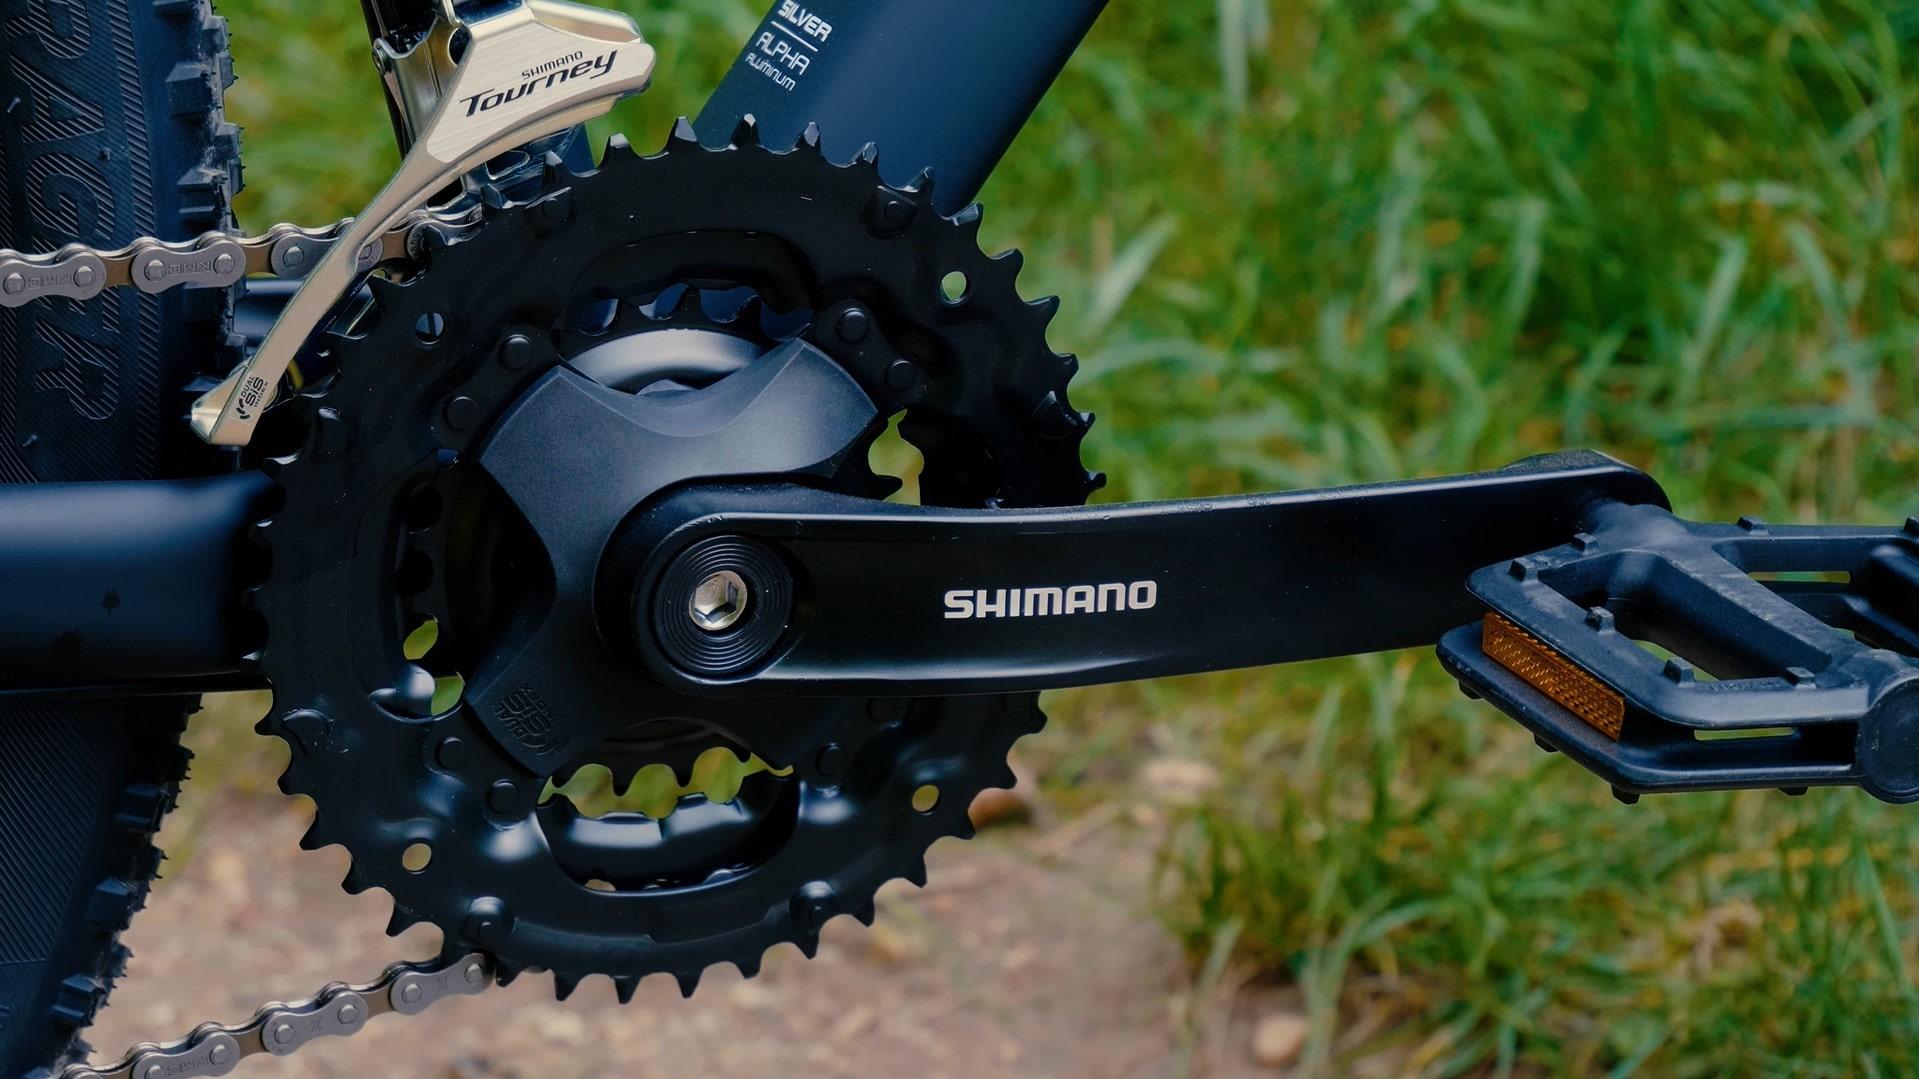 Trek Marlin 5 2020 - Einstiegs-Mountainbike - MTB Shimano Tourney Kurbel